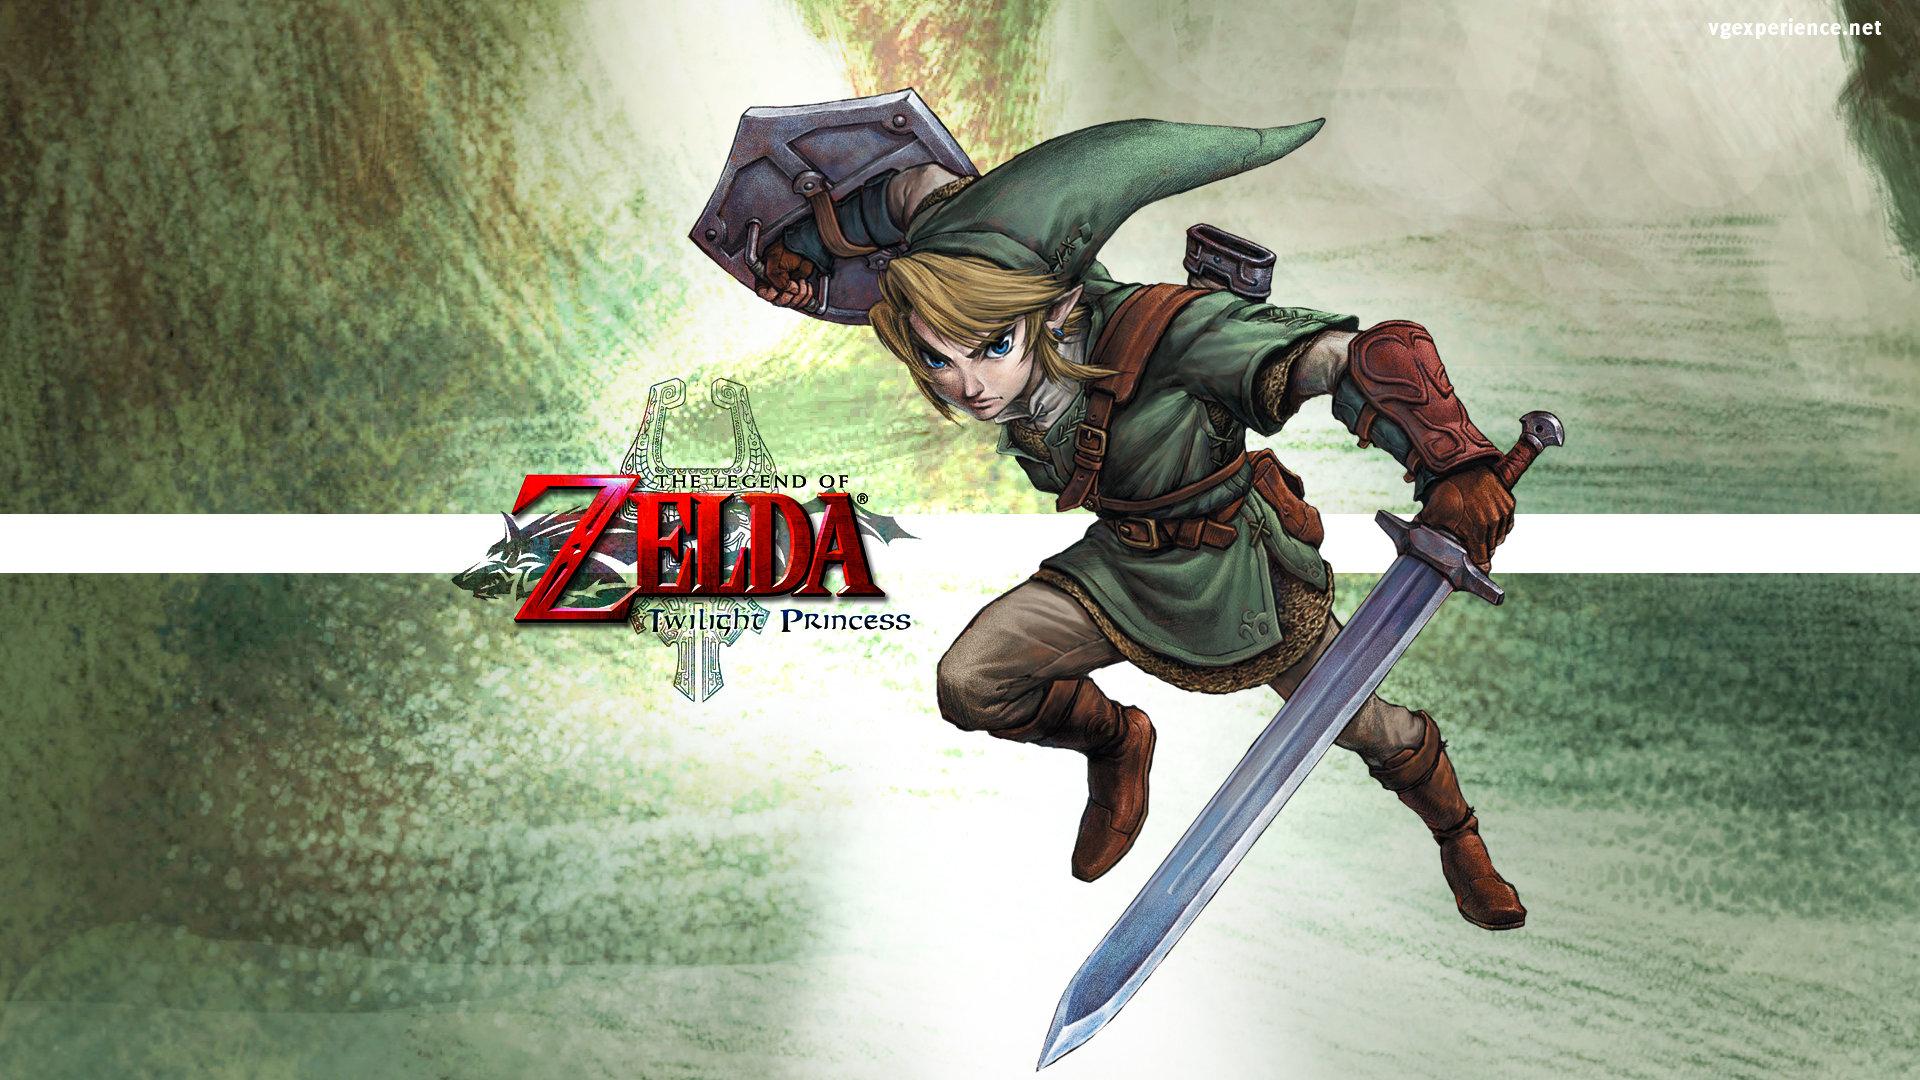 Free The Legend Of Zelda Twilight Princess High Quality